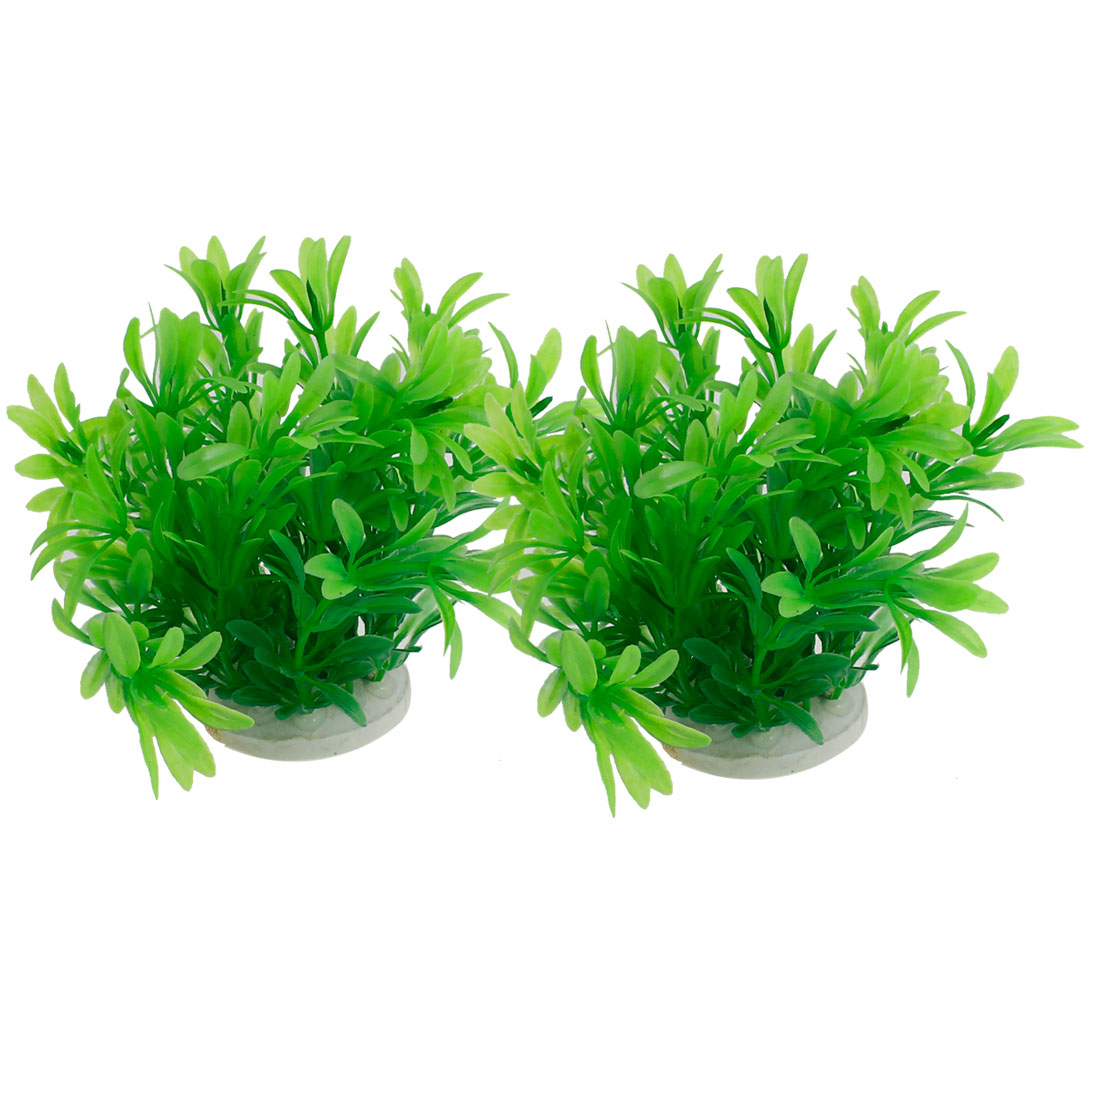 2PCS Manmade Plastic 10cm High Grass Plants Green for Fish Tank Aquarium